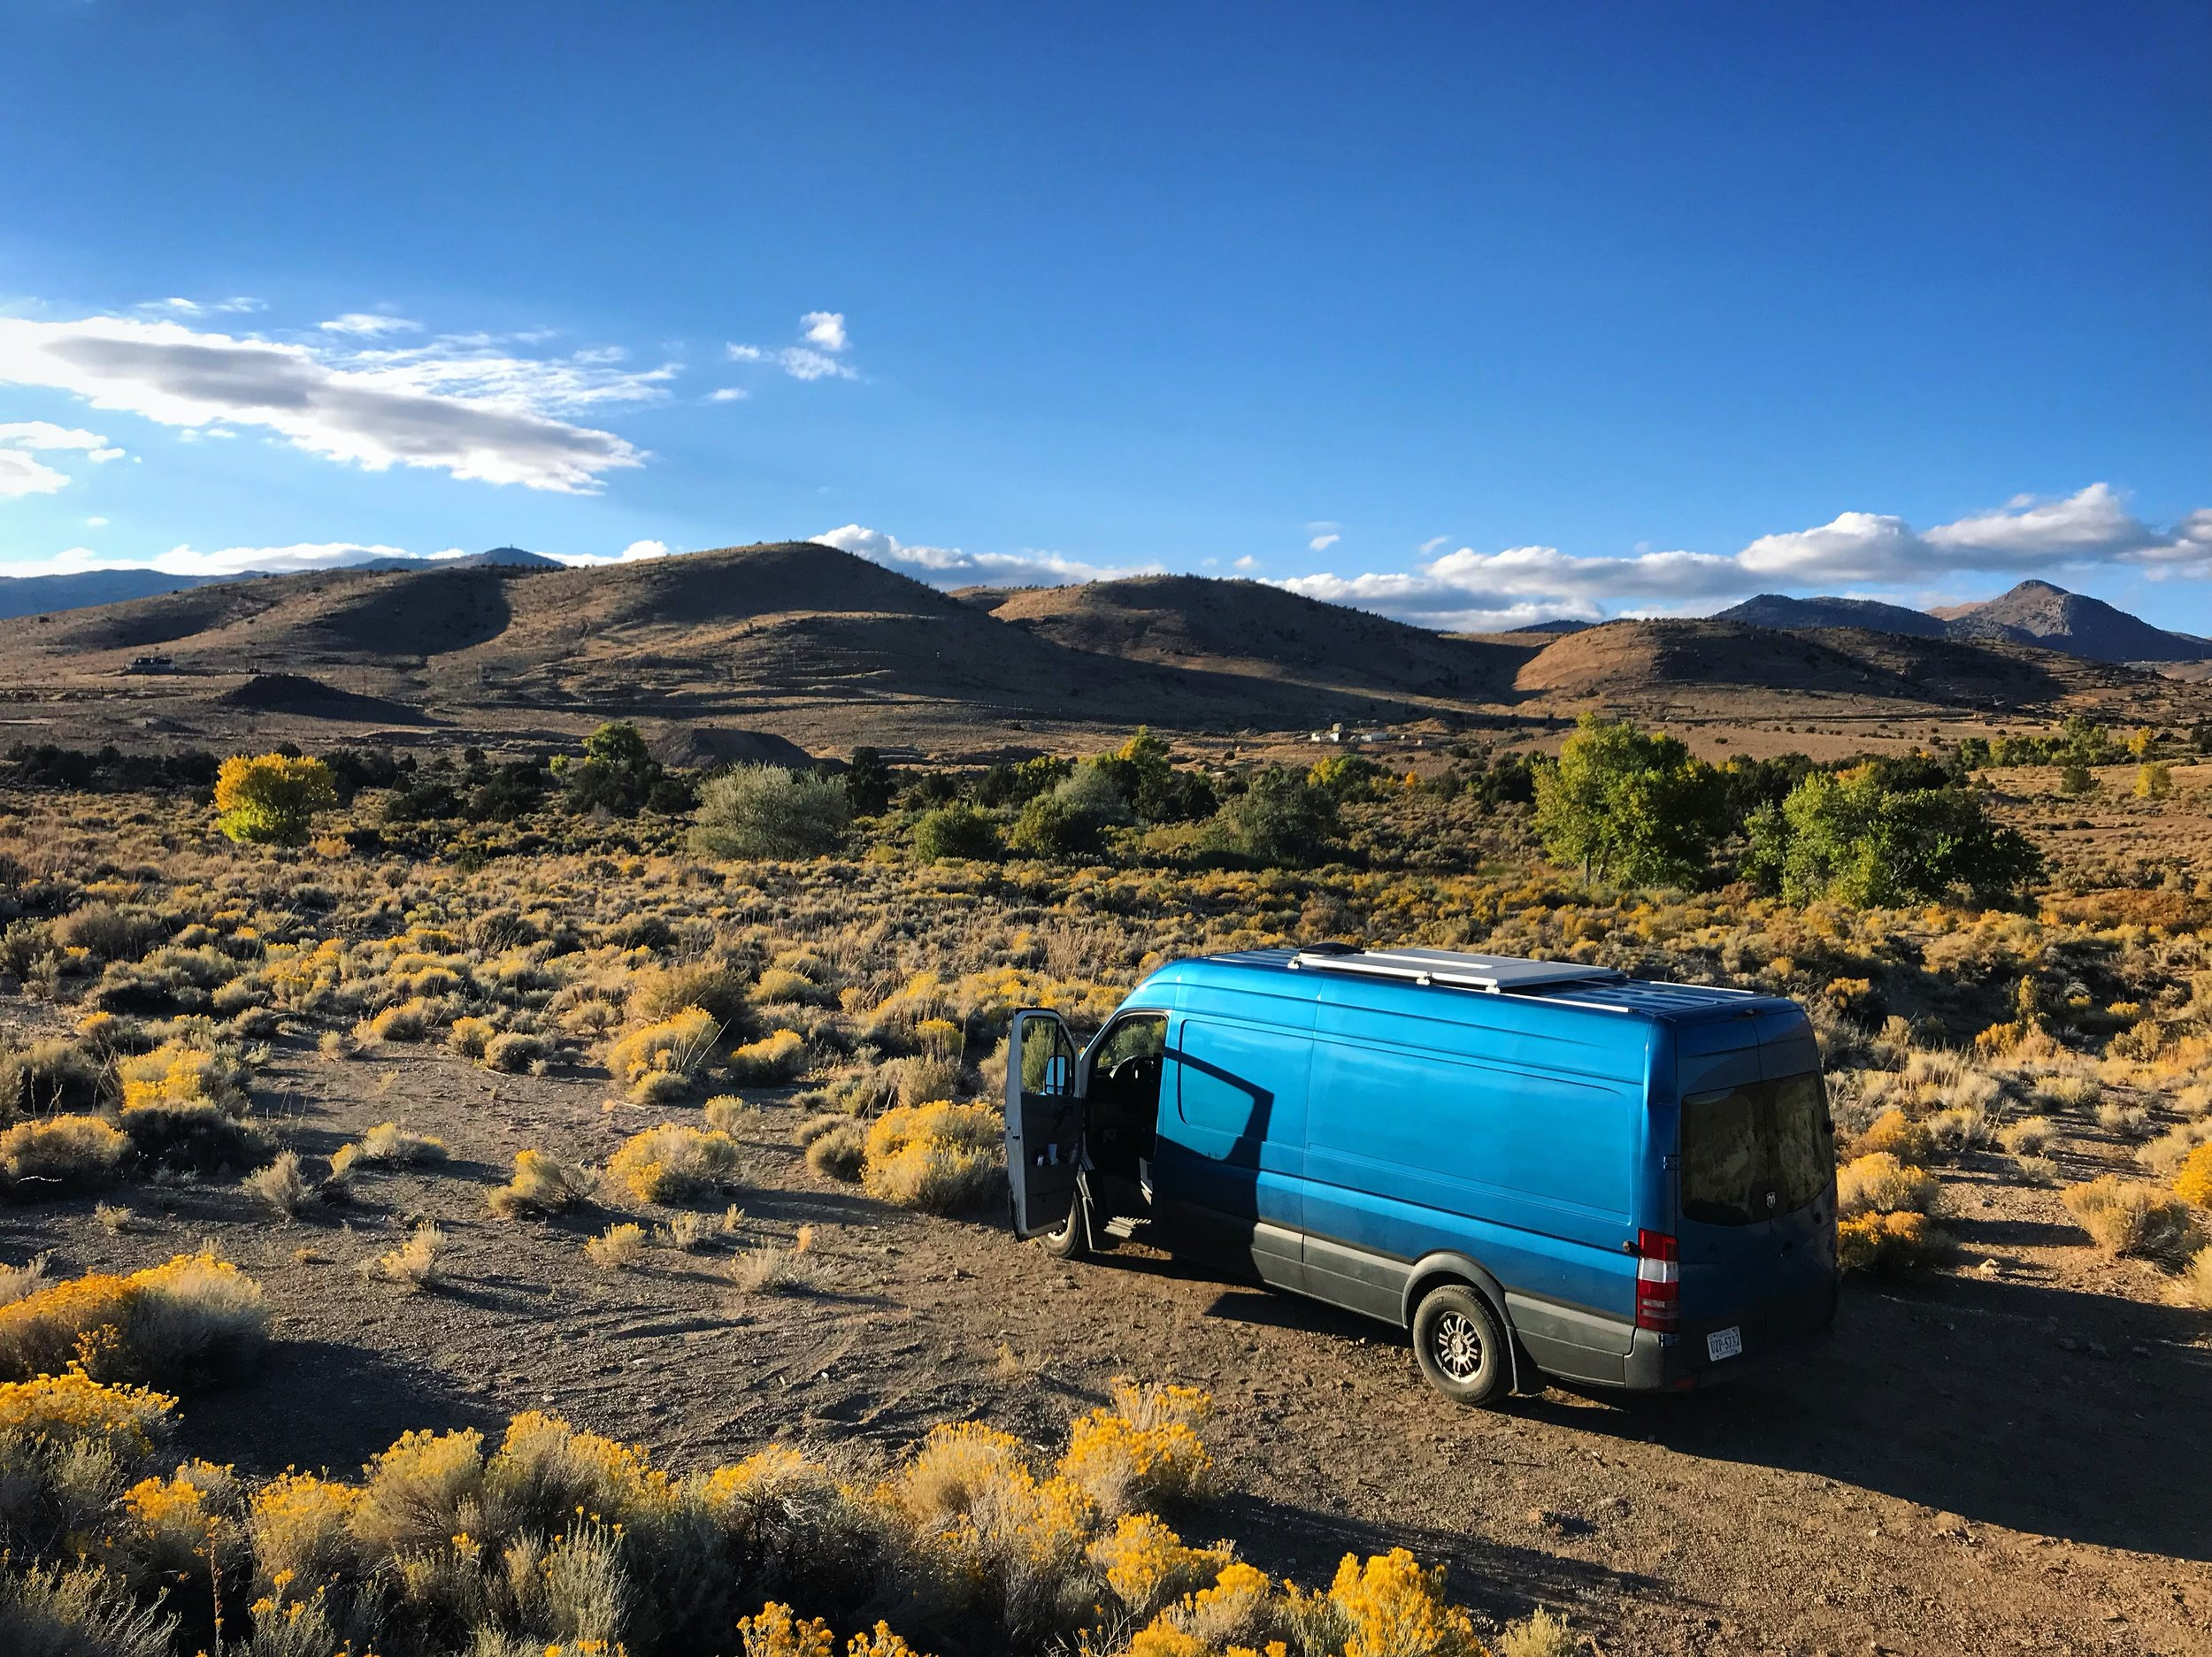 The free camping spot on BLM land near Dayton, Nevada.